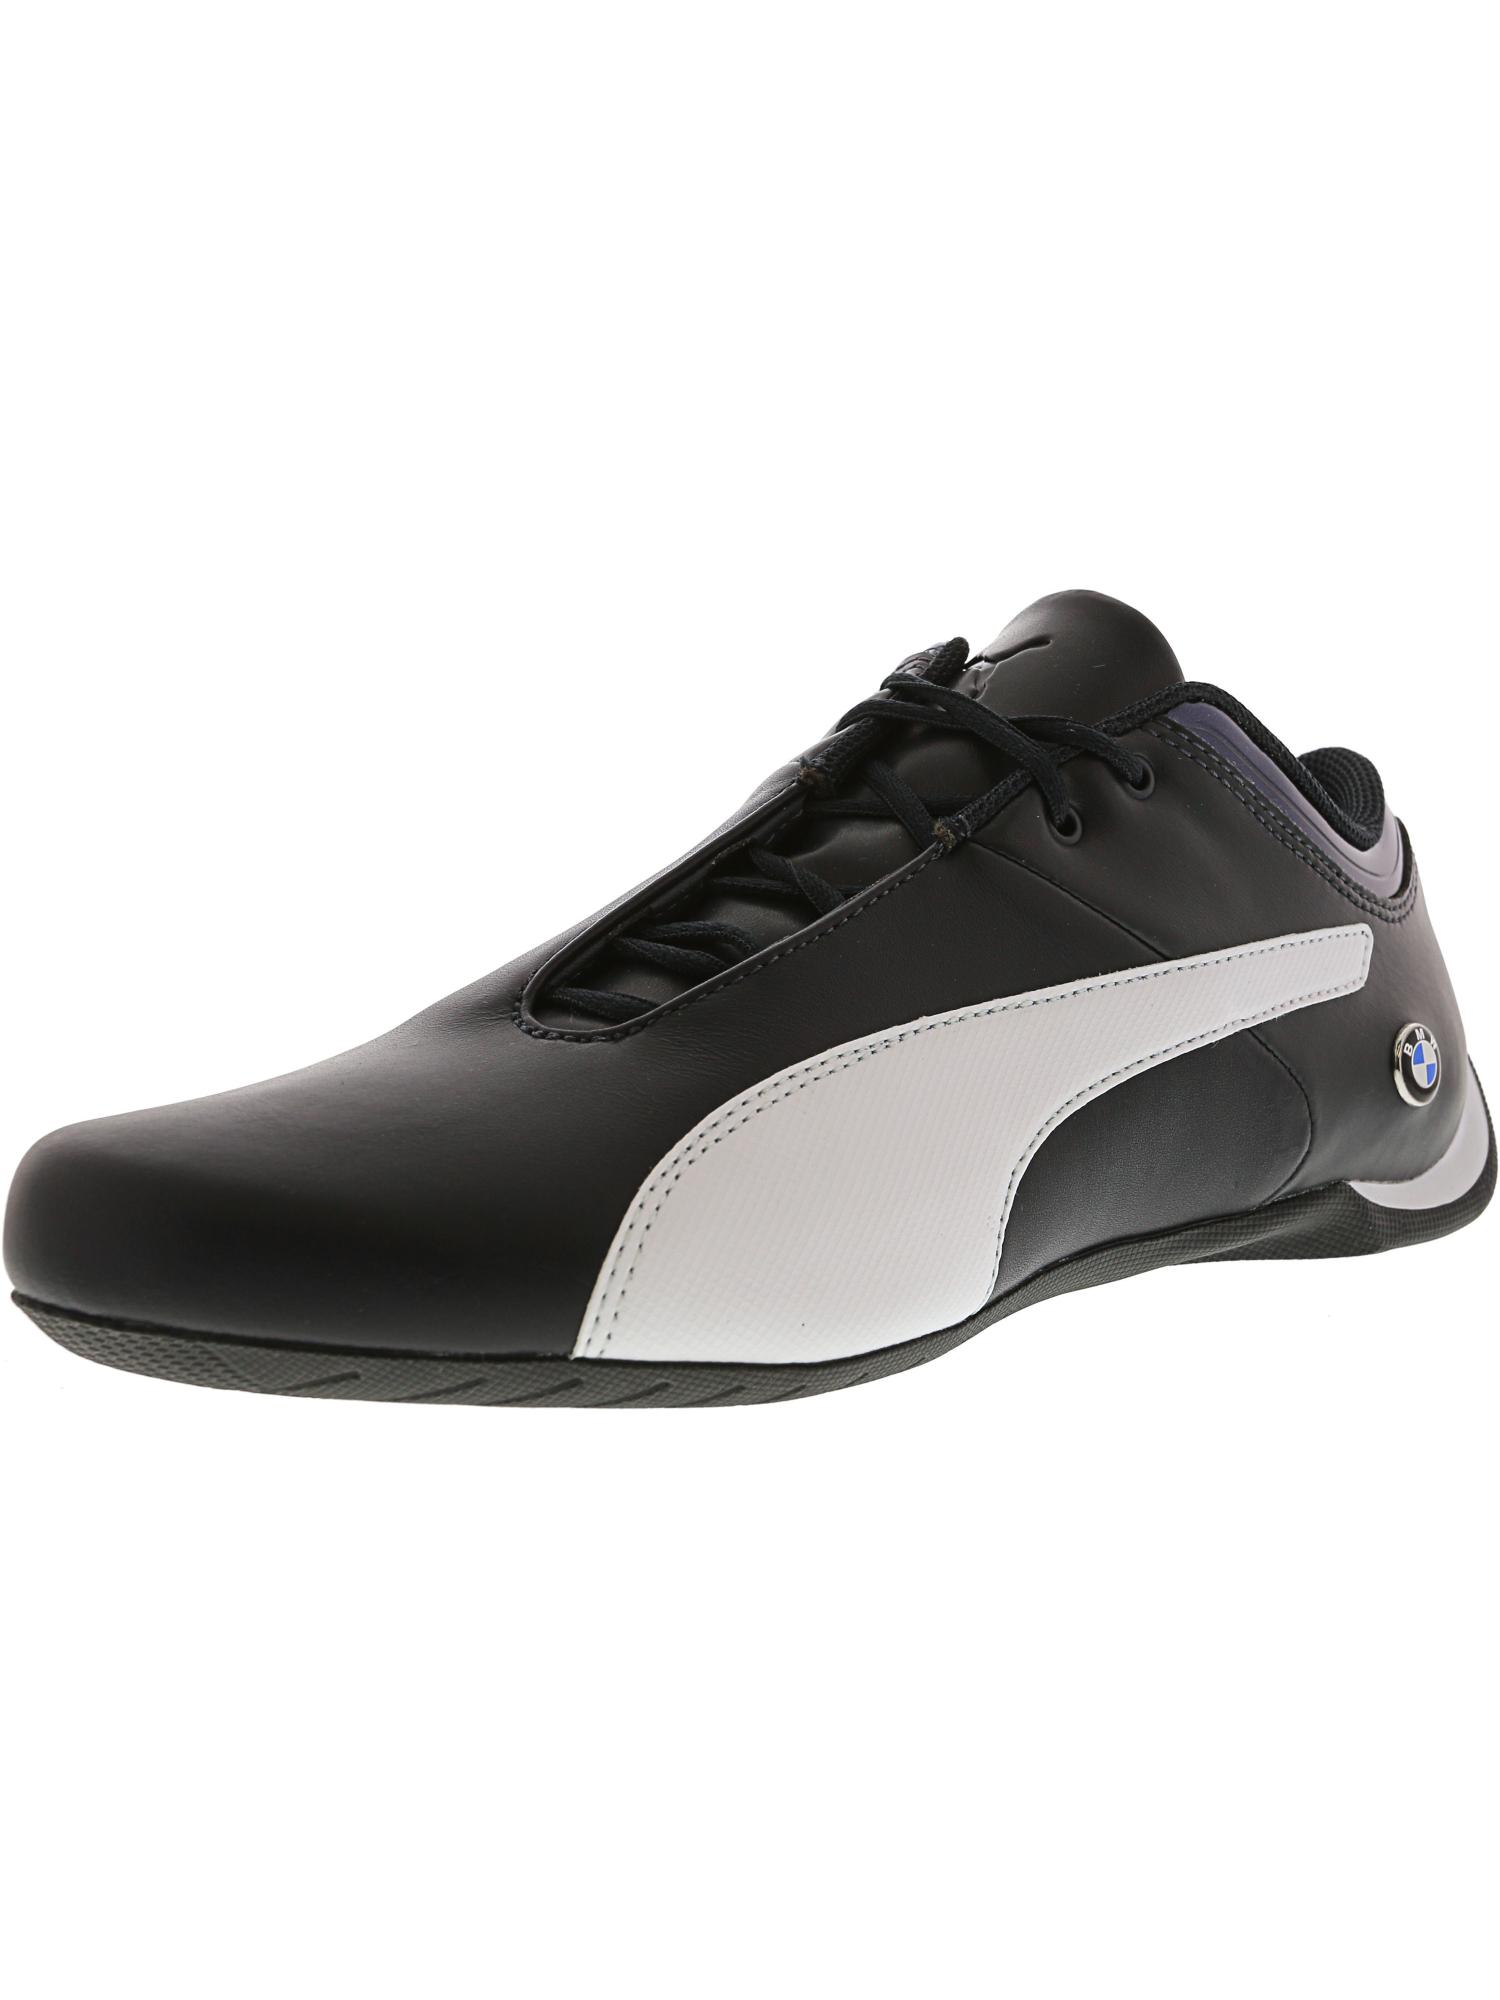 Puma männer bmw frau zukunft katze knöchel knöchel knöchel hohen leder sneaker mode dc6d6a